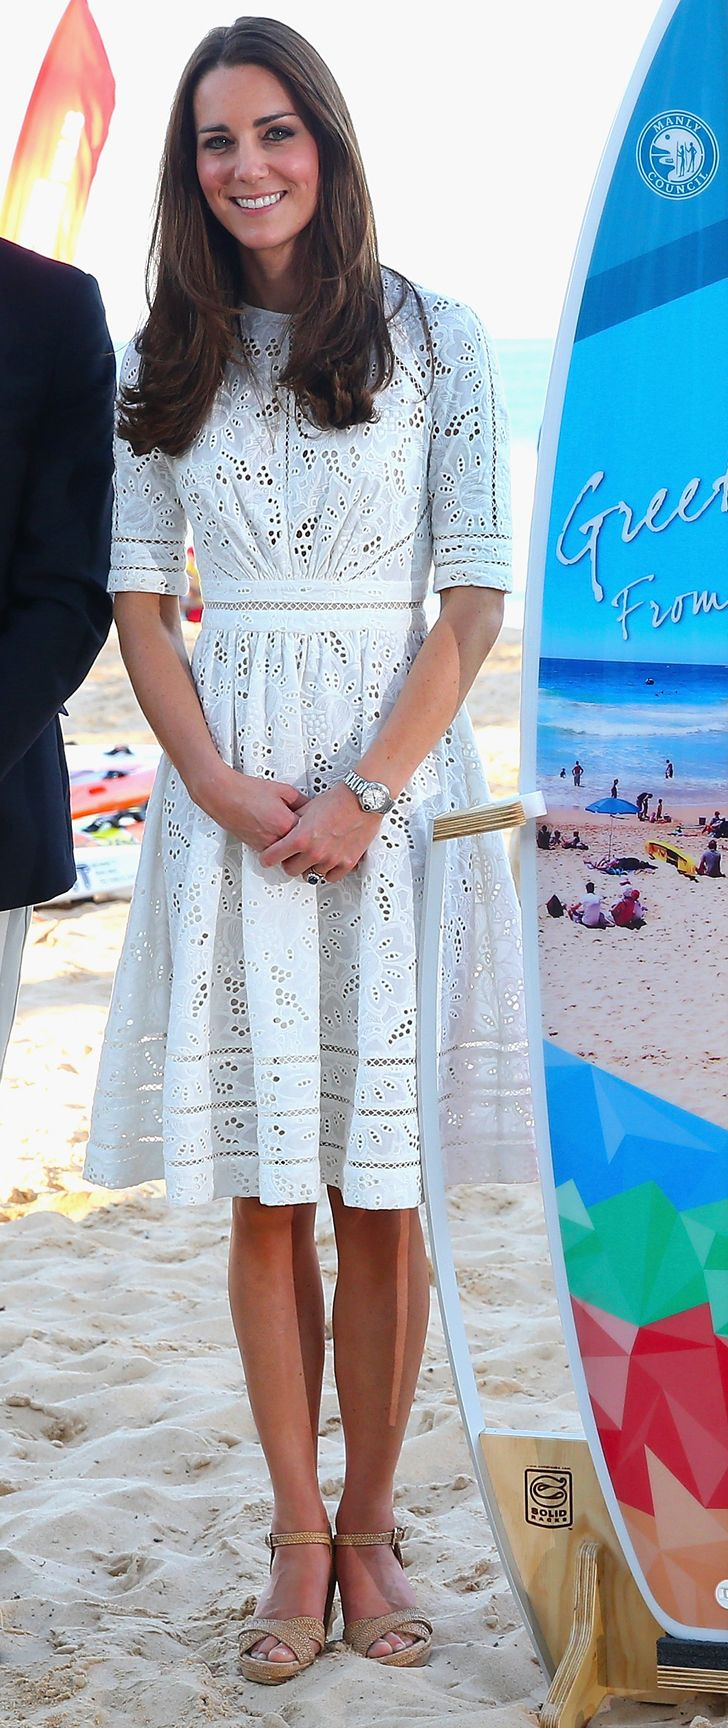 Kate hit Sydney's beach in an aptly breezy LWD. April 18, 2014